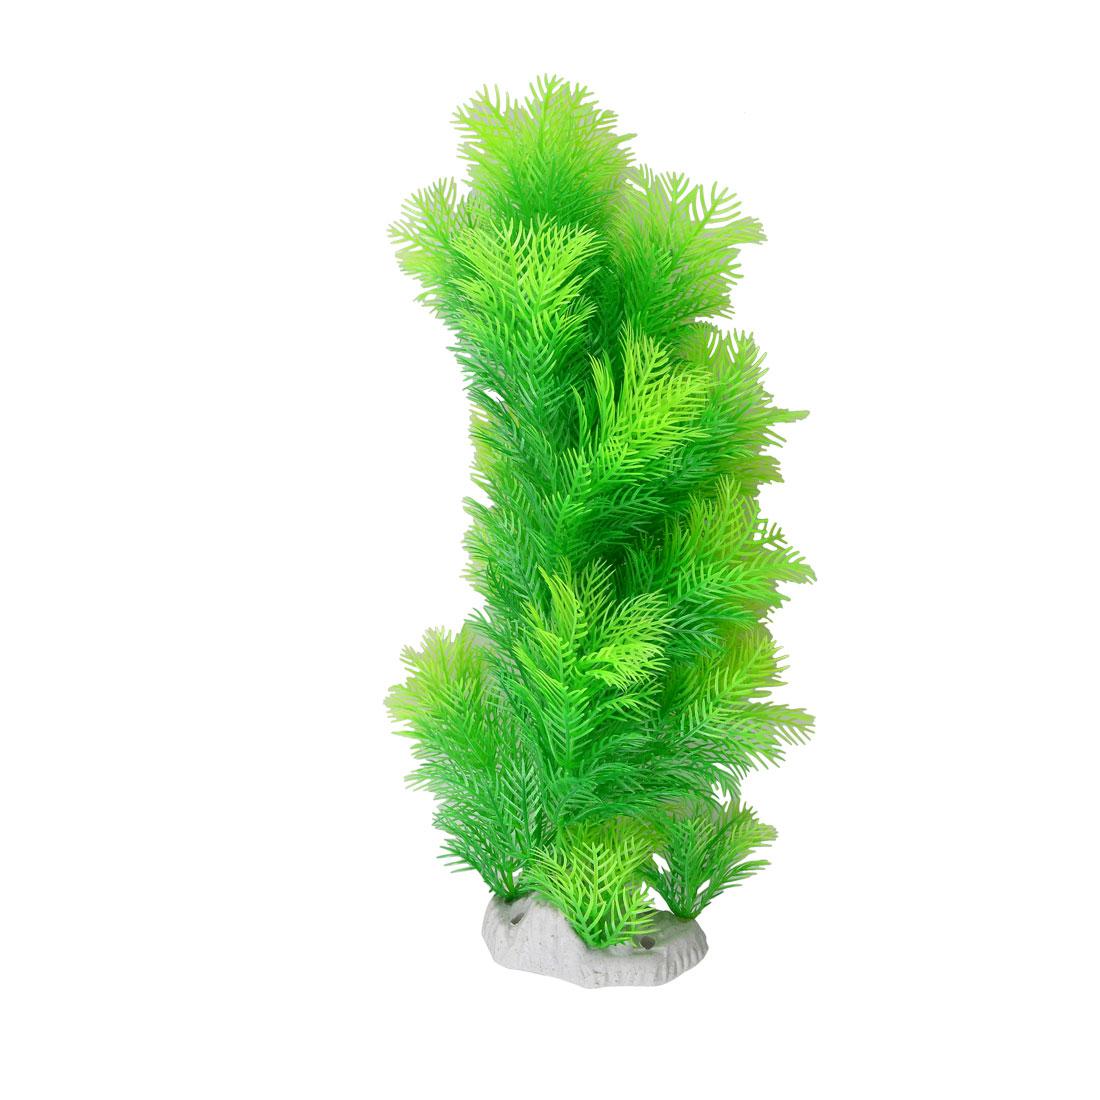 "Underwater Decor Green Artificial Plant Grass 13"" for Aquarium"